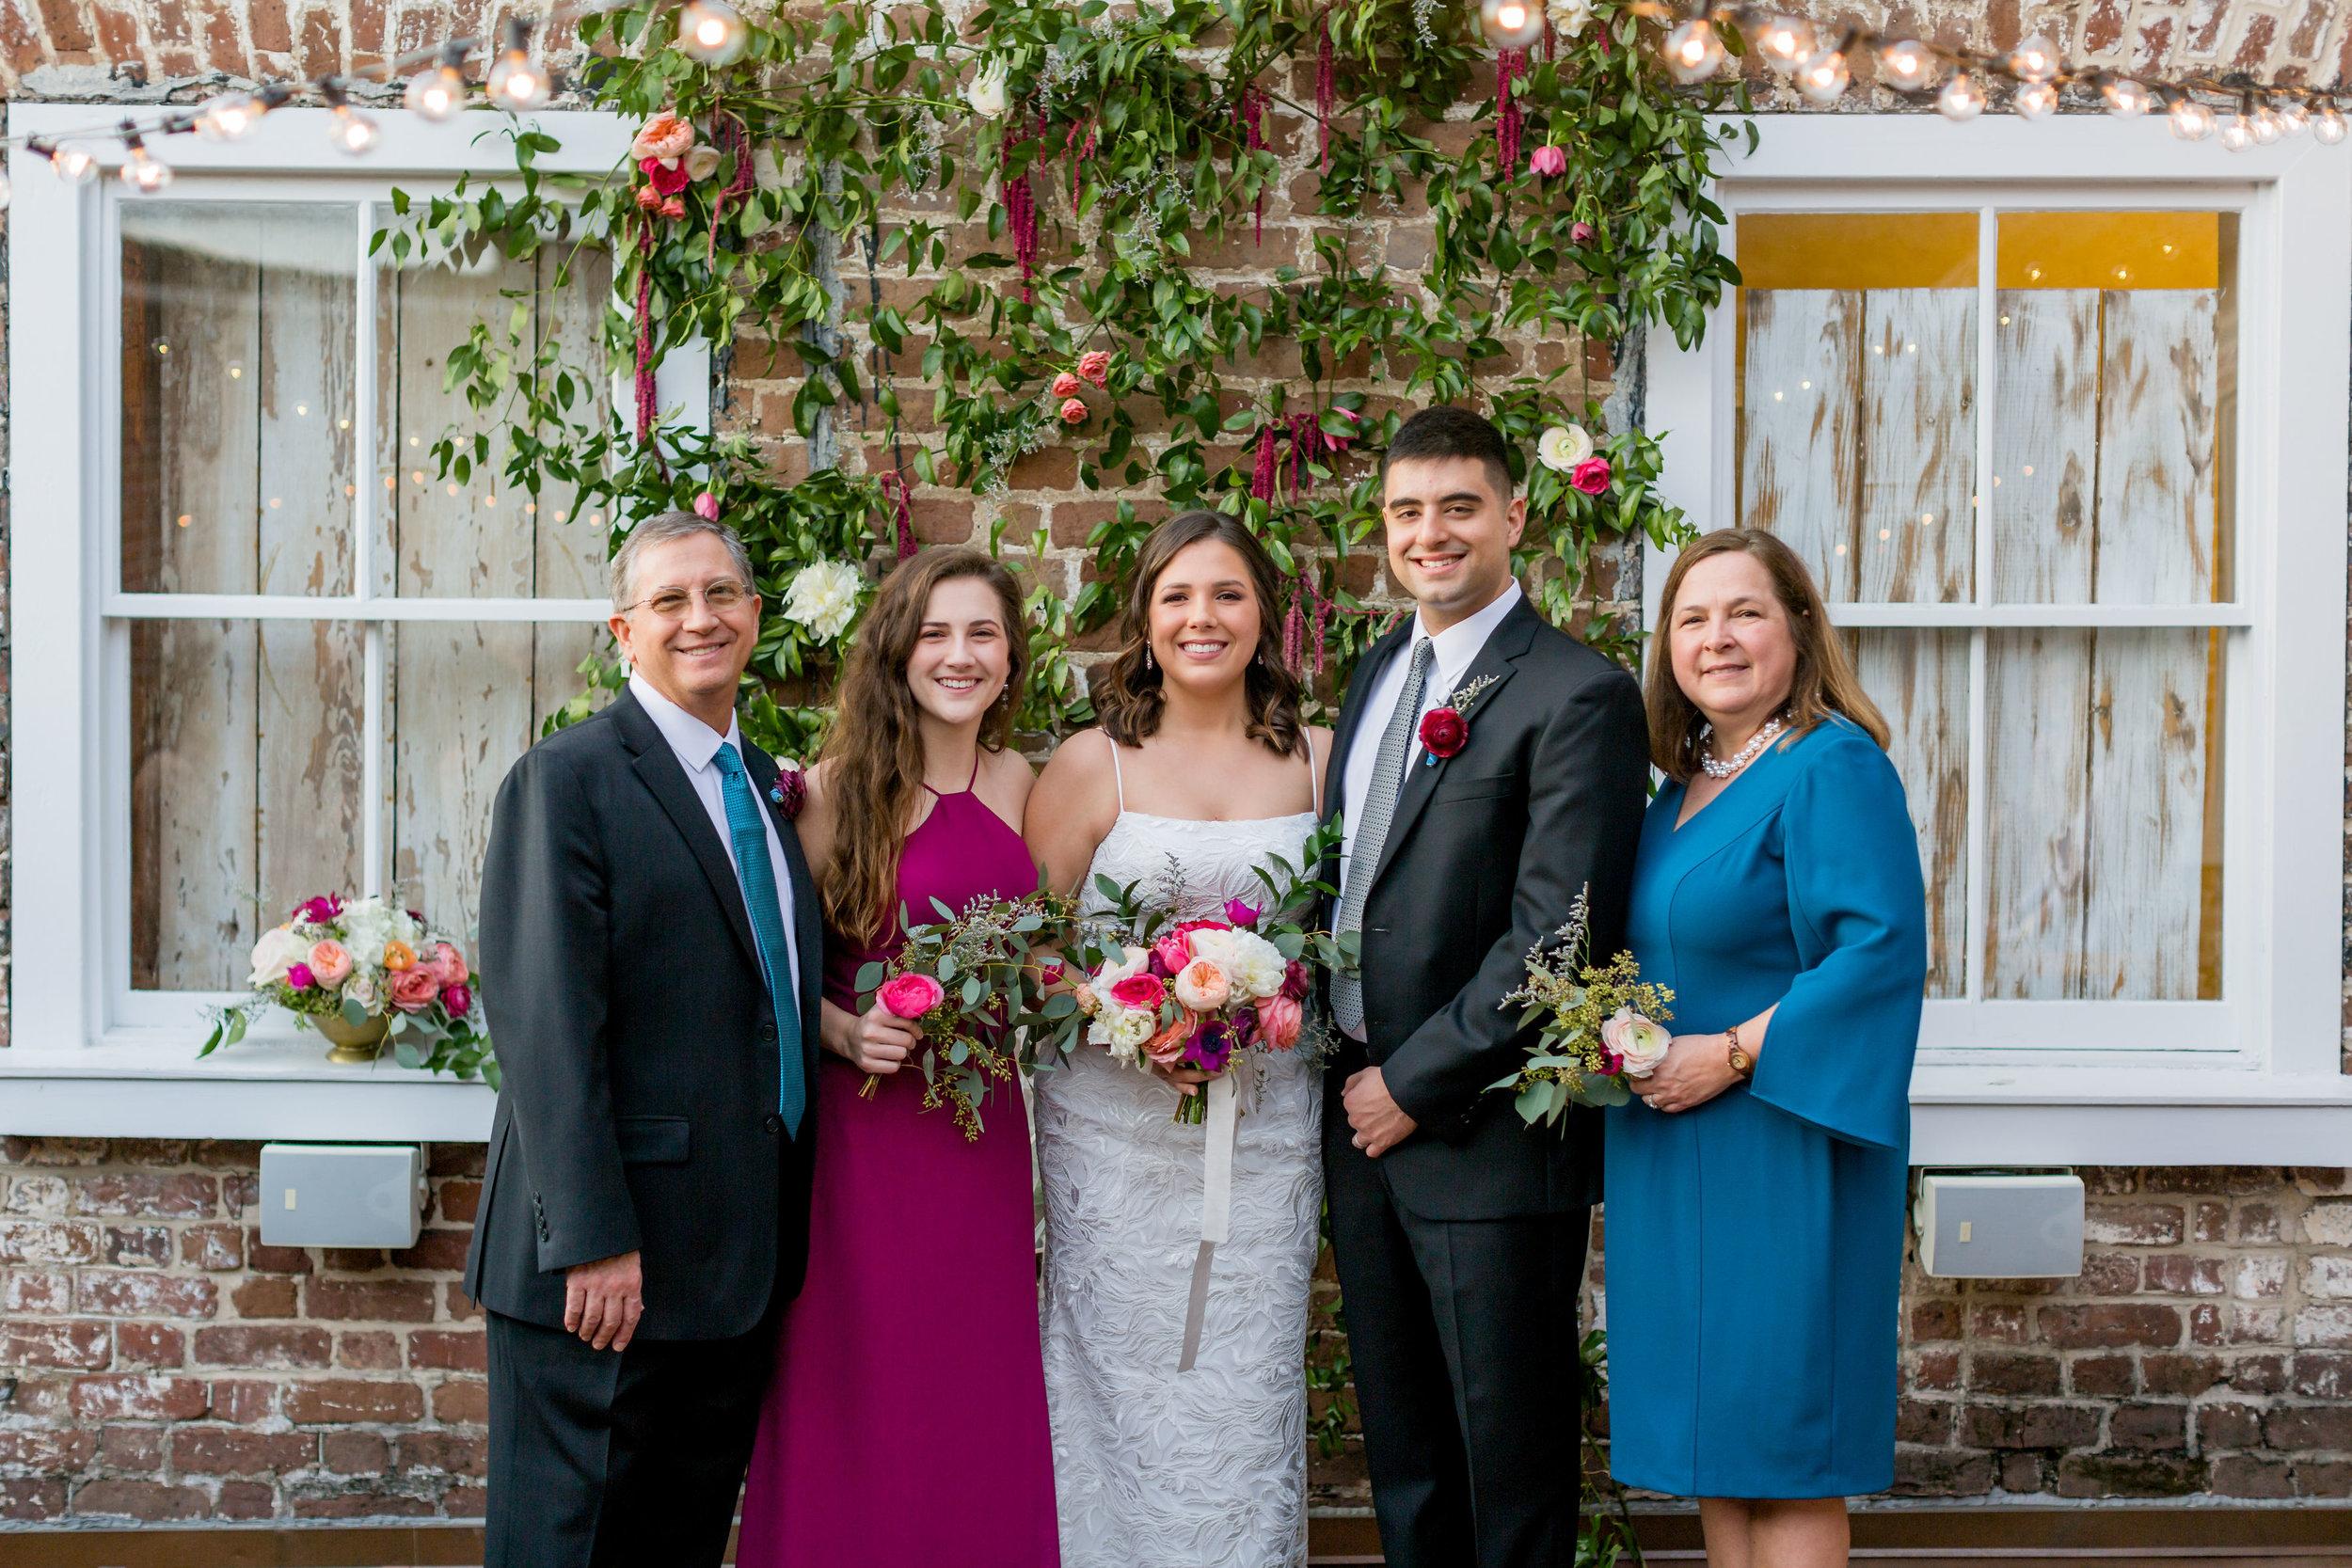 charleston new years elopement popup surprise wedding at upstairs at midtown - scarlet plan & design wedding planners (176).jpg